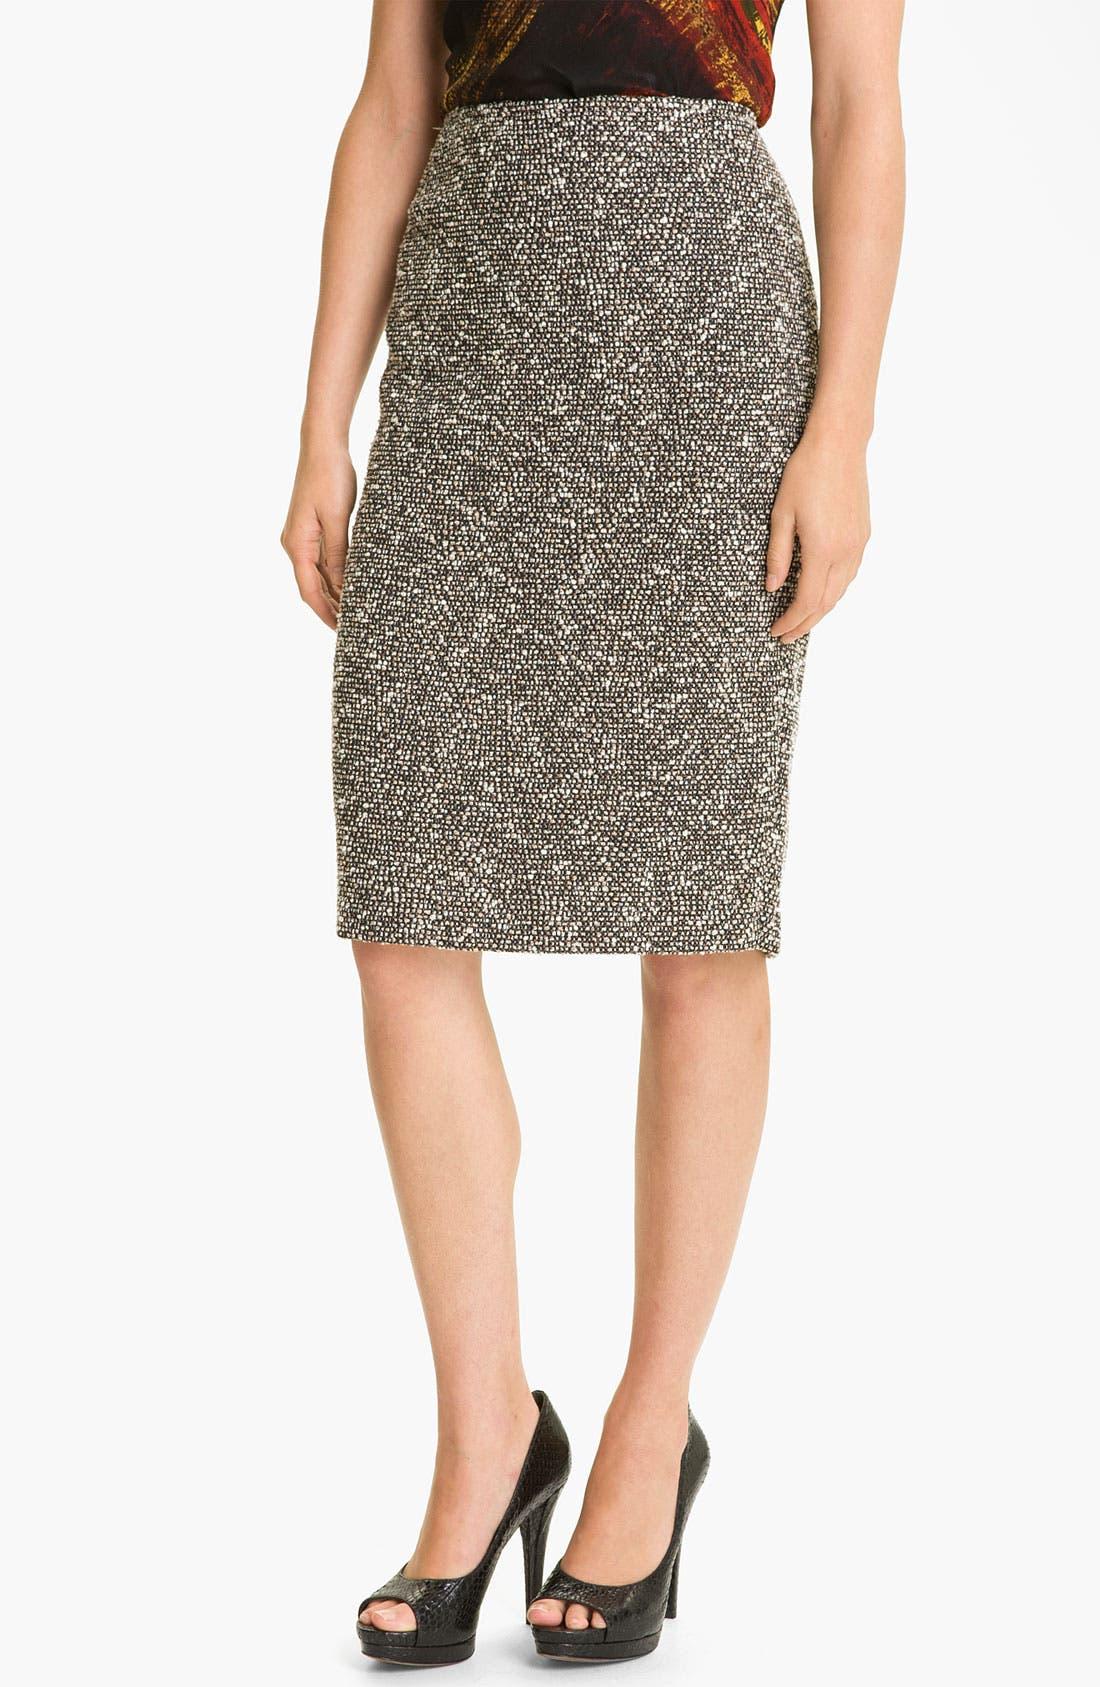 Alternate Image 1 Selected - Lafayette 148 New York 'Bijoux' Slim Tweed Skirt